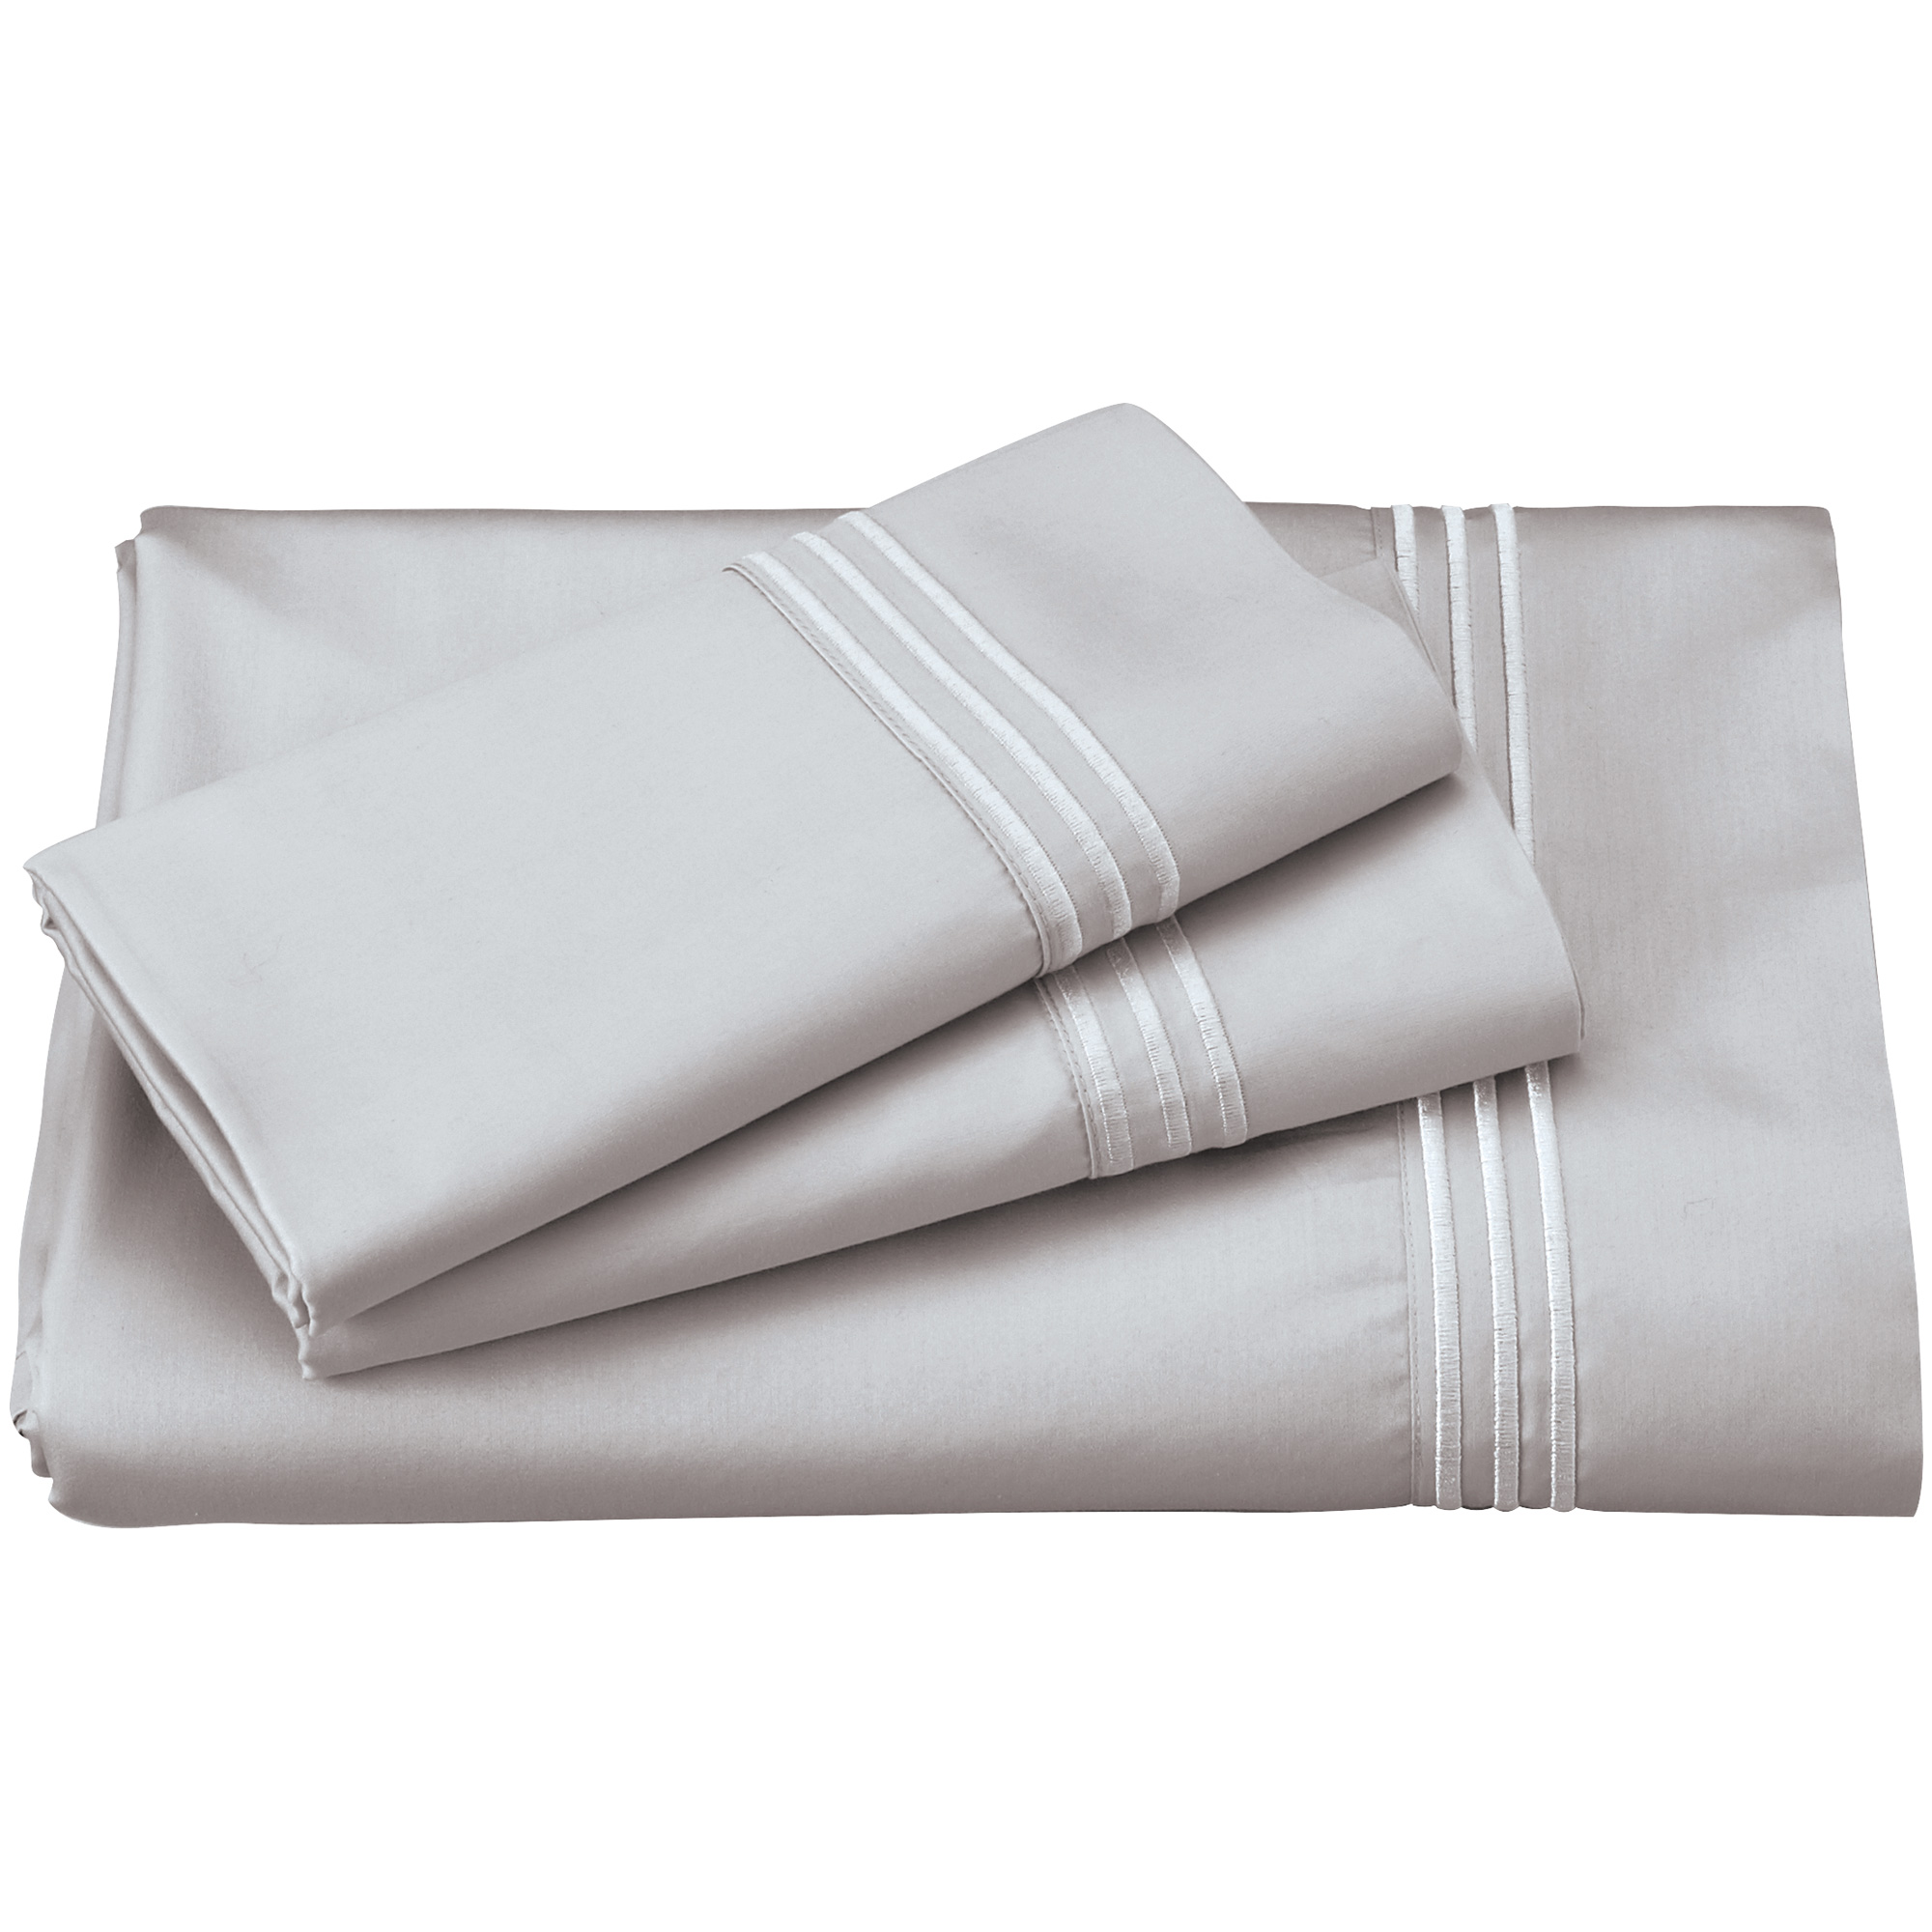 Purecare | Elements Dove Gray Queen Celliant Sheet Set